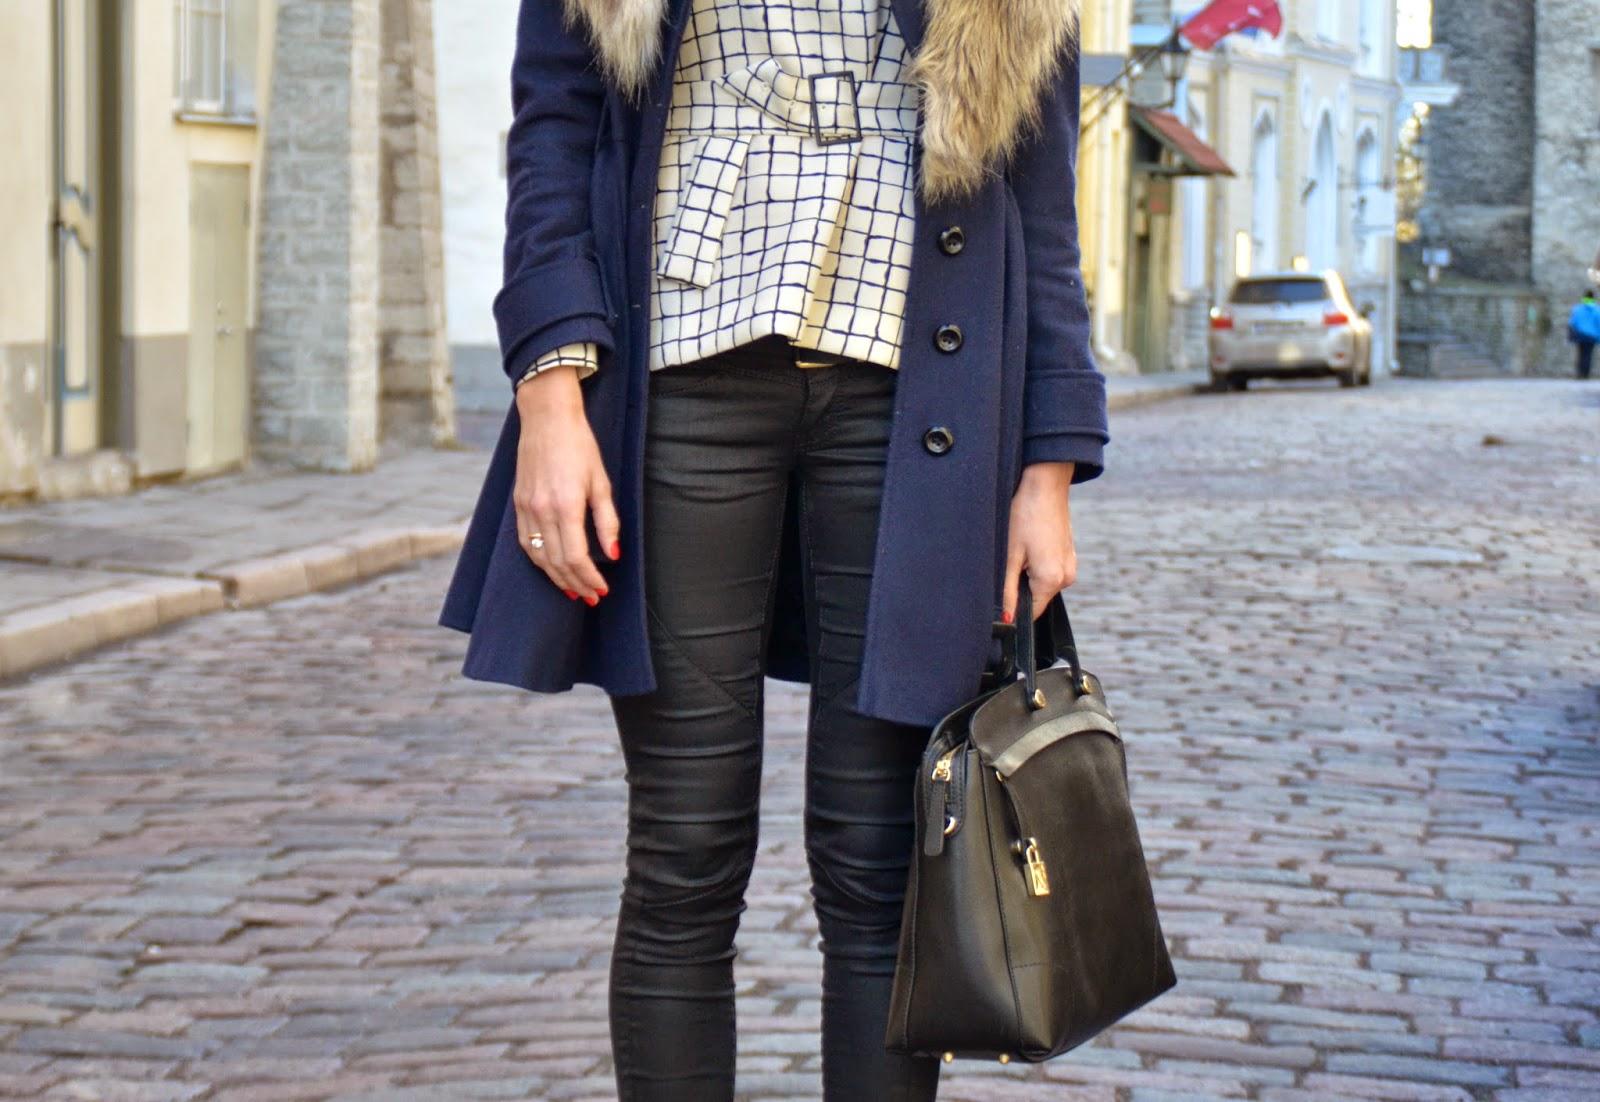 zara-check-print-top-guess-black-jeans-furla-bag